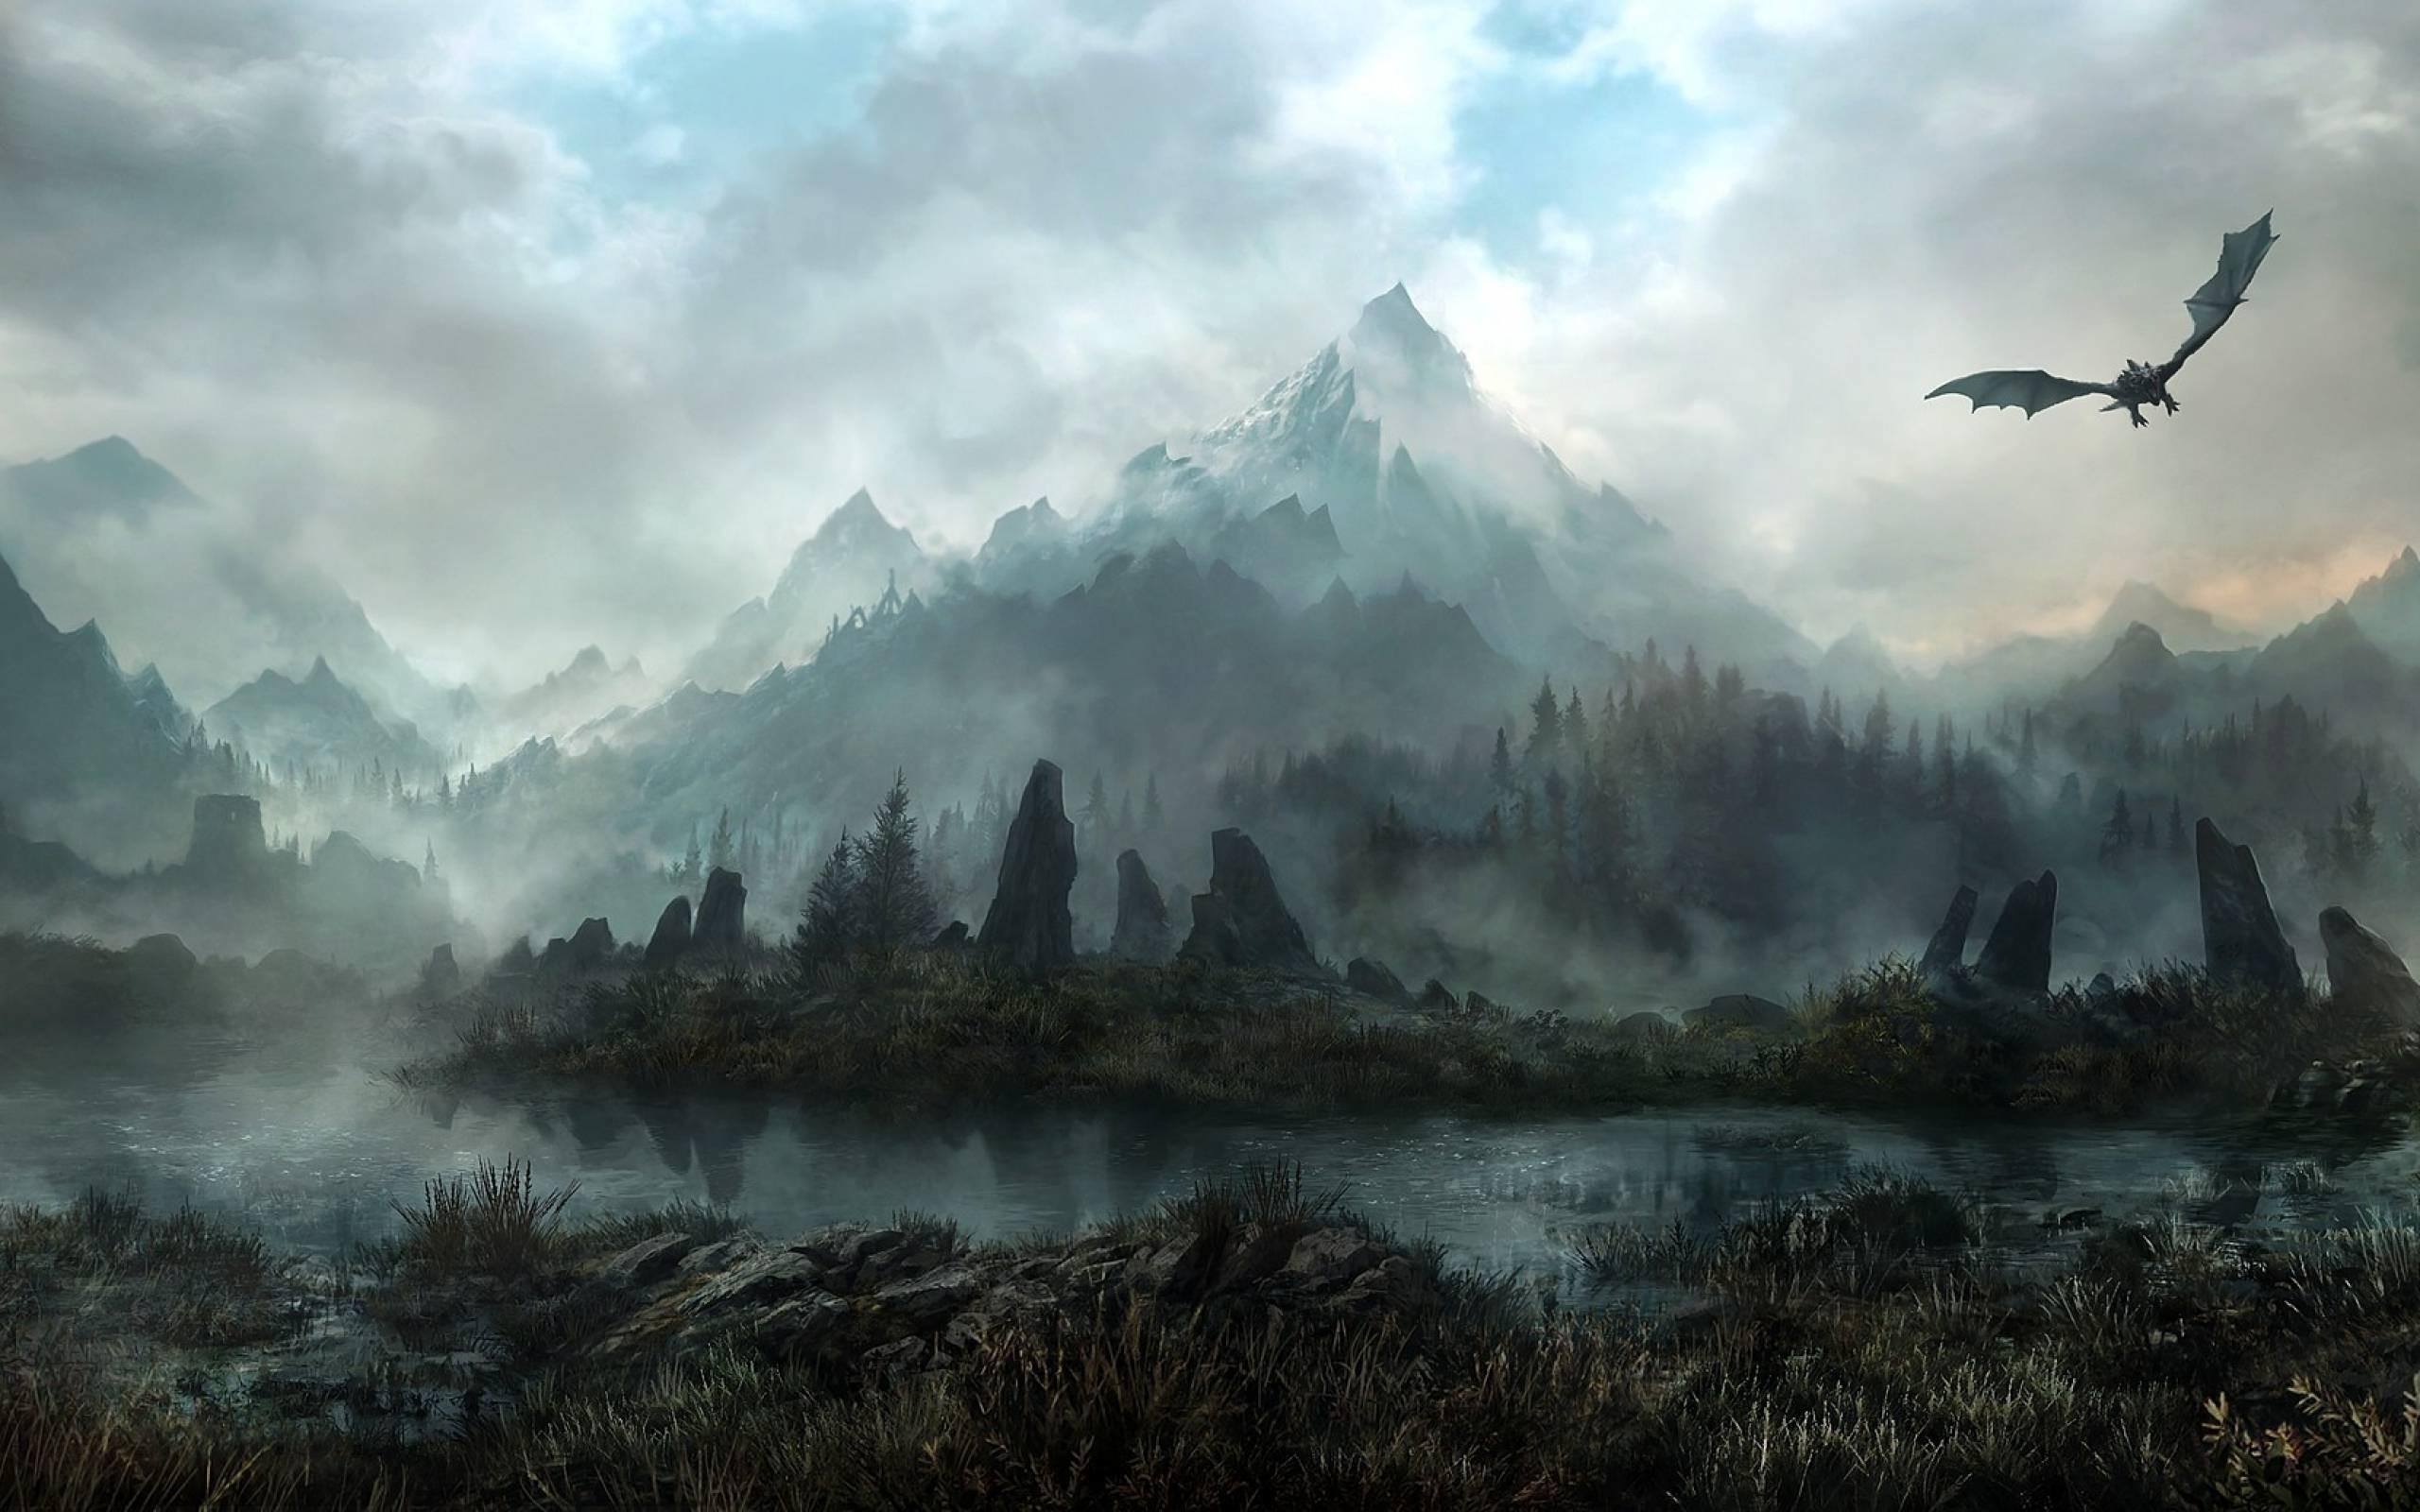 Skyrim Desktop Backgrounds – Wallpaper Cave